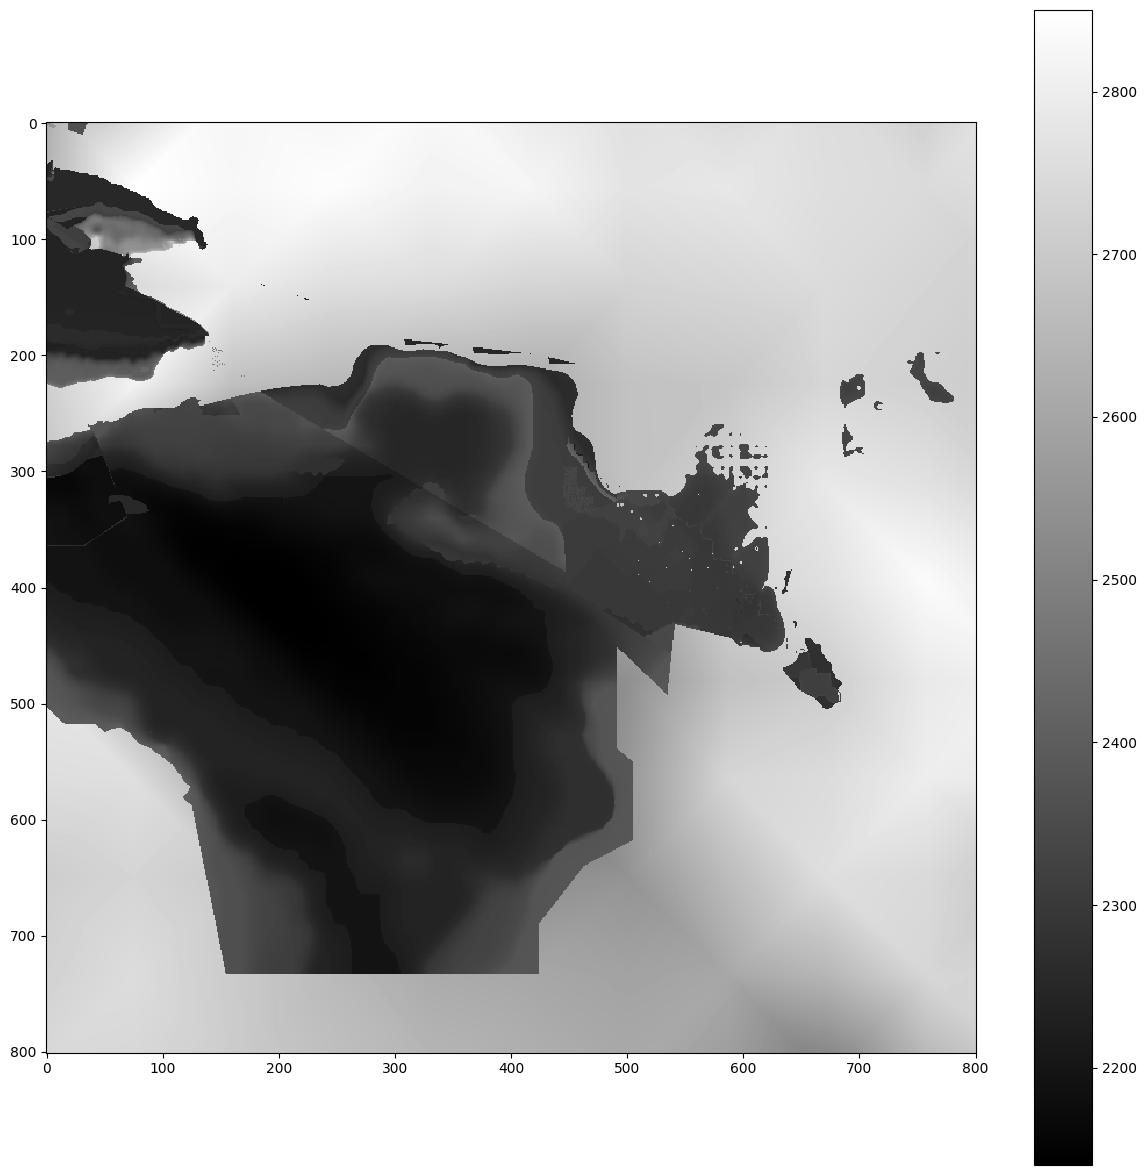 bench/seismic/wp/la_habra/meshes/velocity_model/plots/rho_500.png